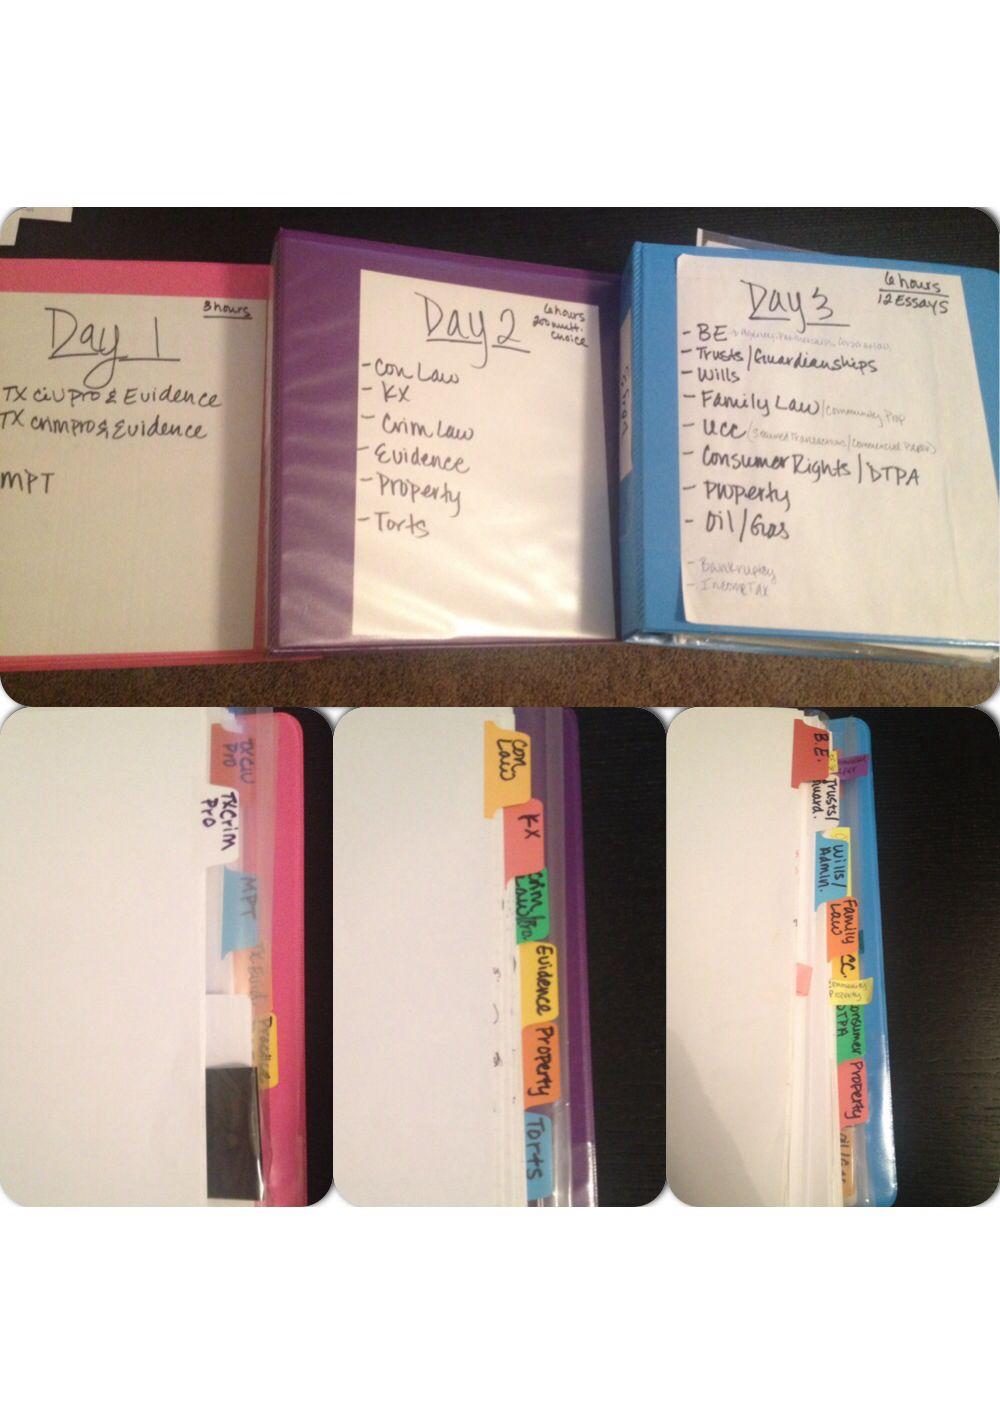 Texas bar prep organization binders for each day; tabs